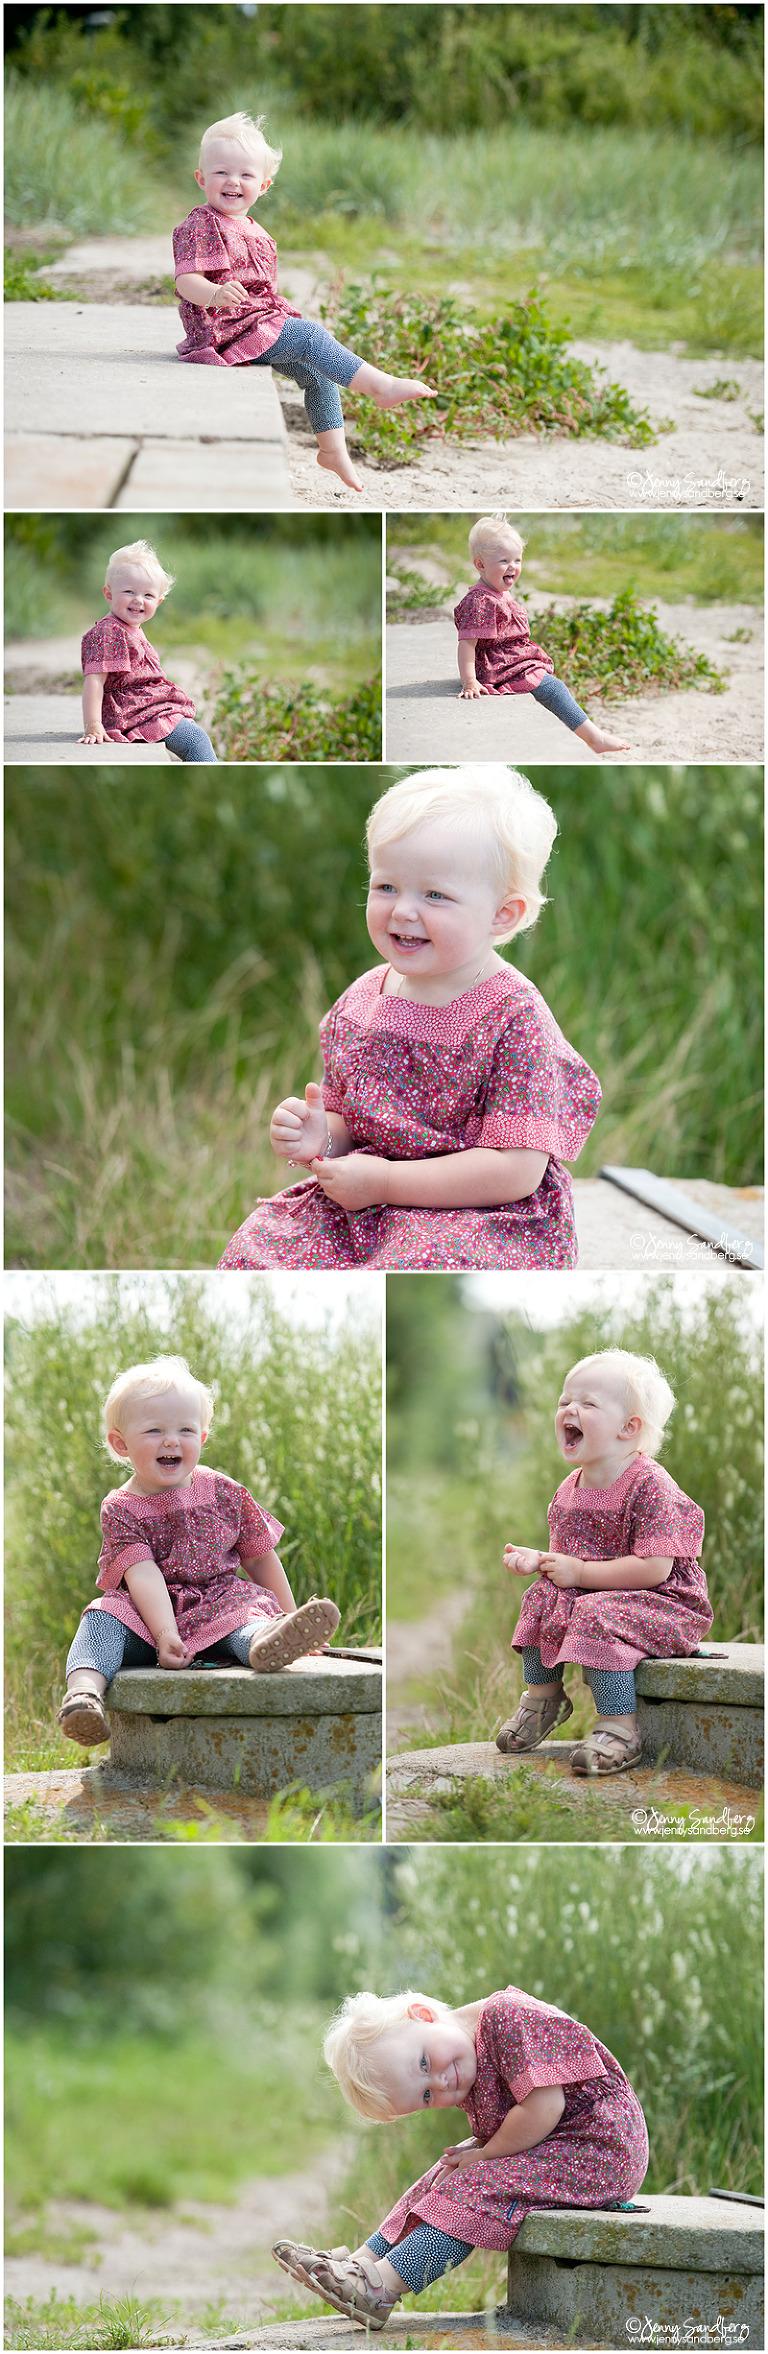 barnfotograf lund, babyfoto lund, barnfotograf helsingborg, babyfotograf lomma, babyfoto lomma, babyfoto lund